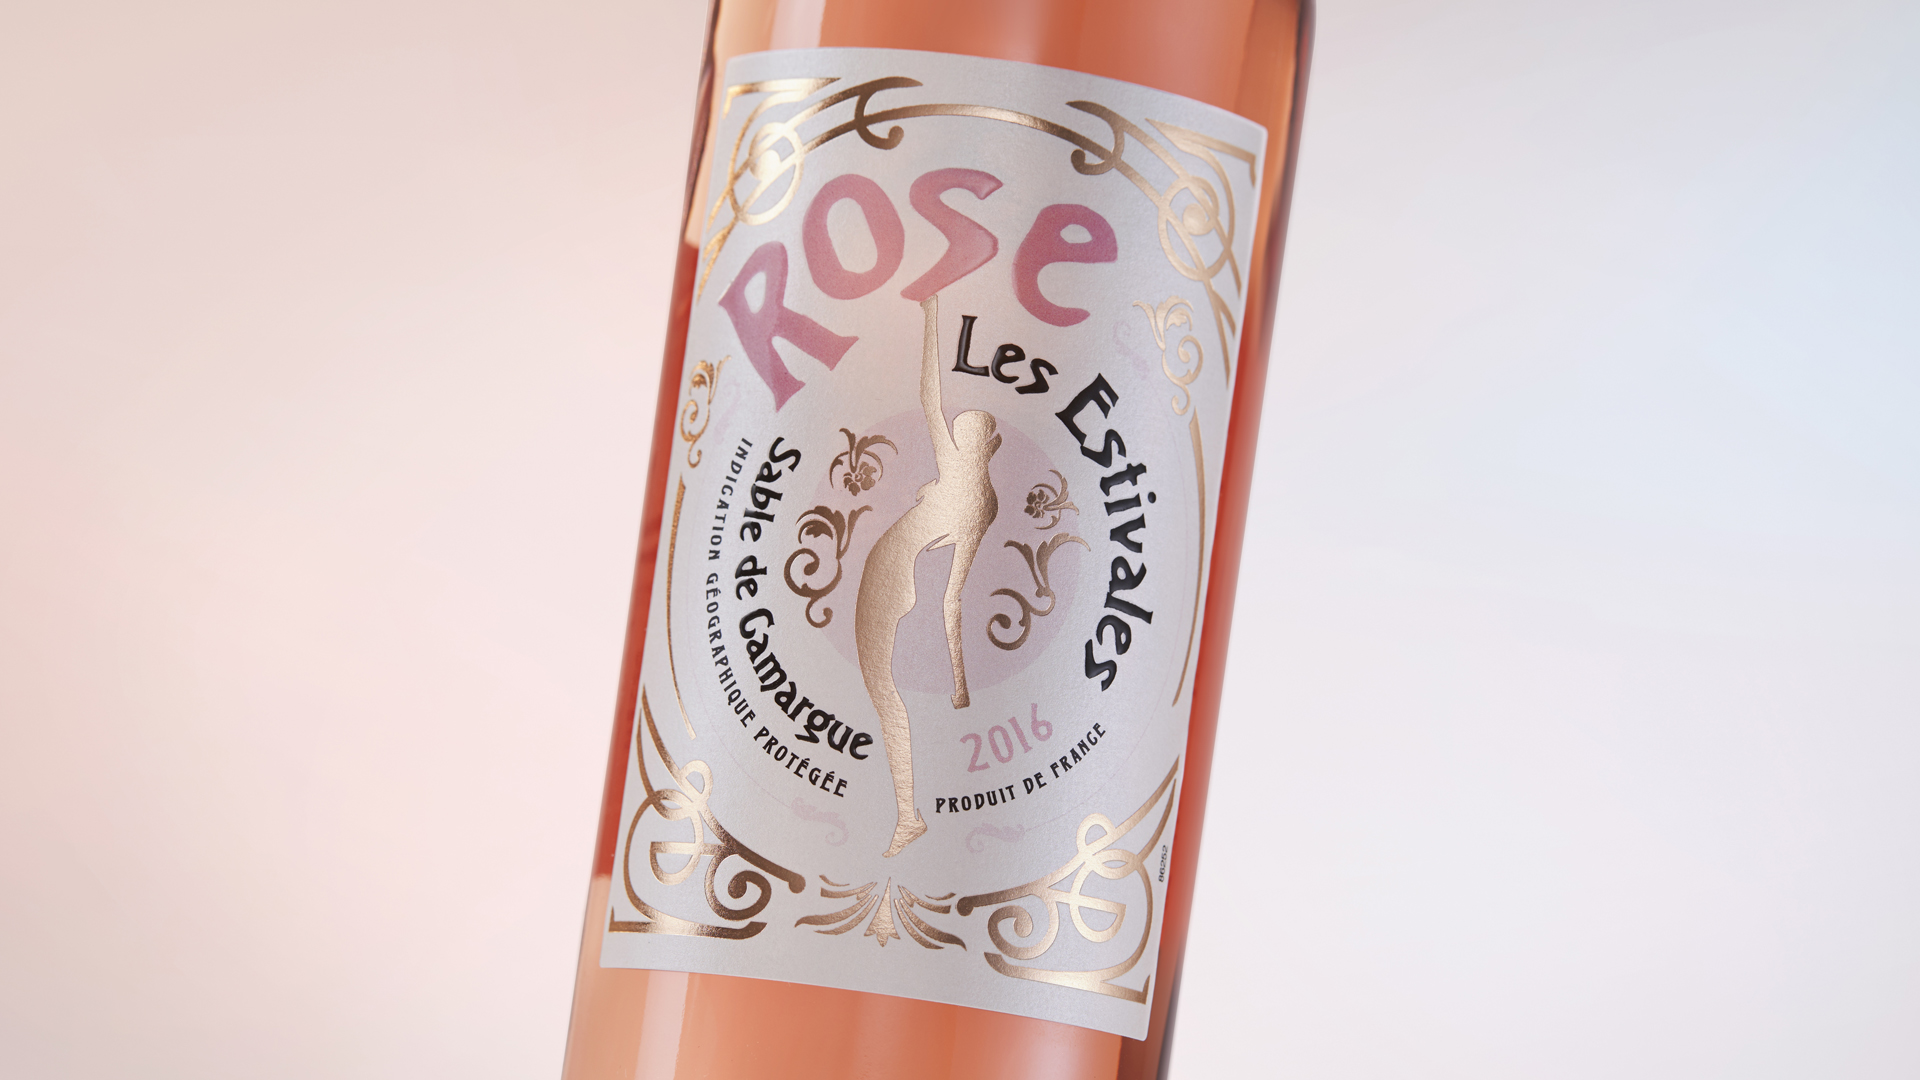 1 Rose.jpg